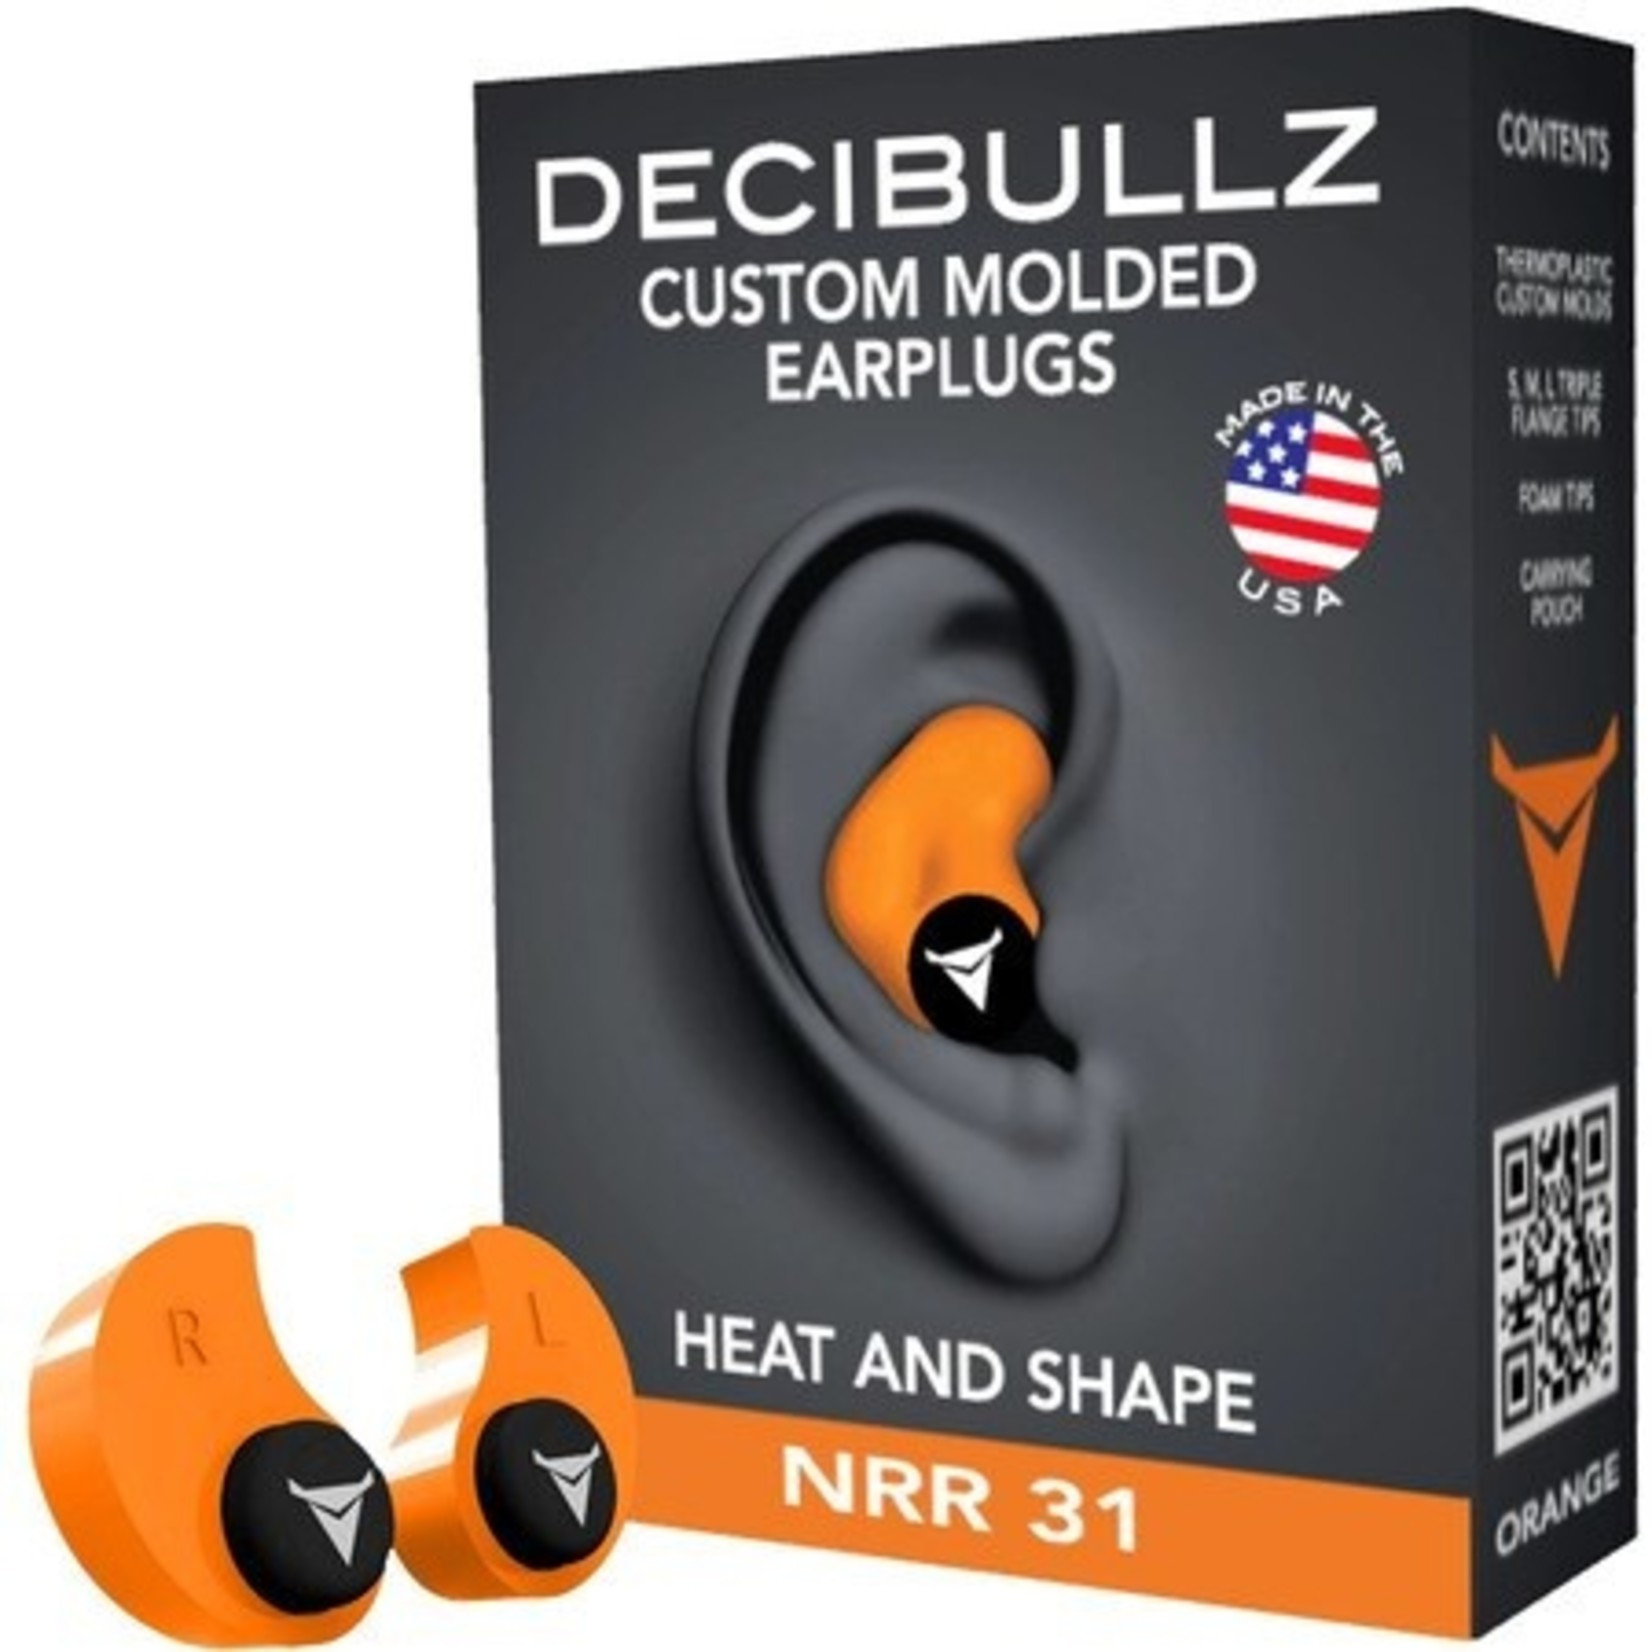 DECIBULLZ CUSTOM MOLDED EAR PLUGS PLG1-ORG